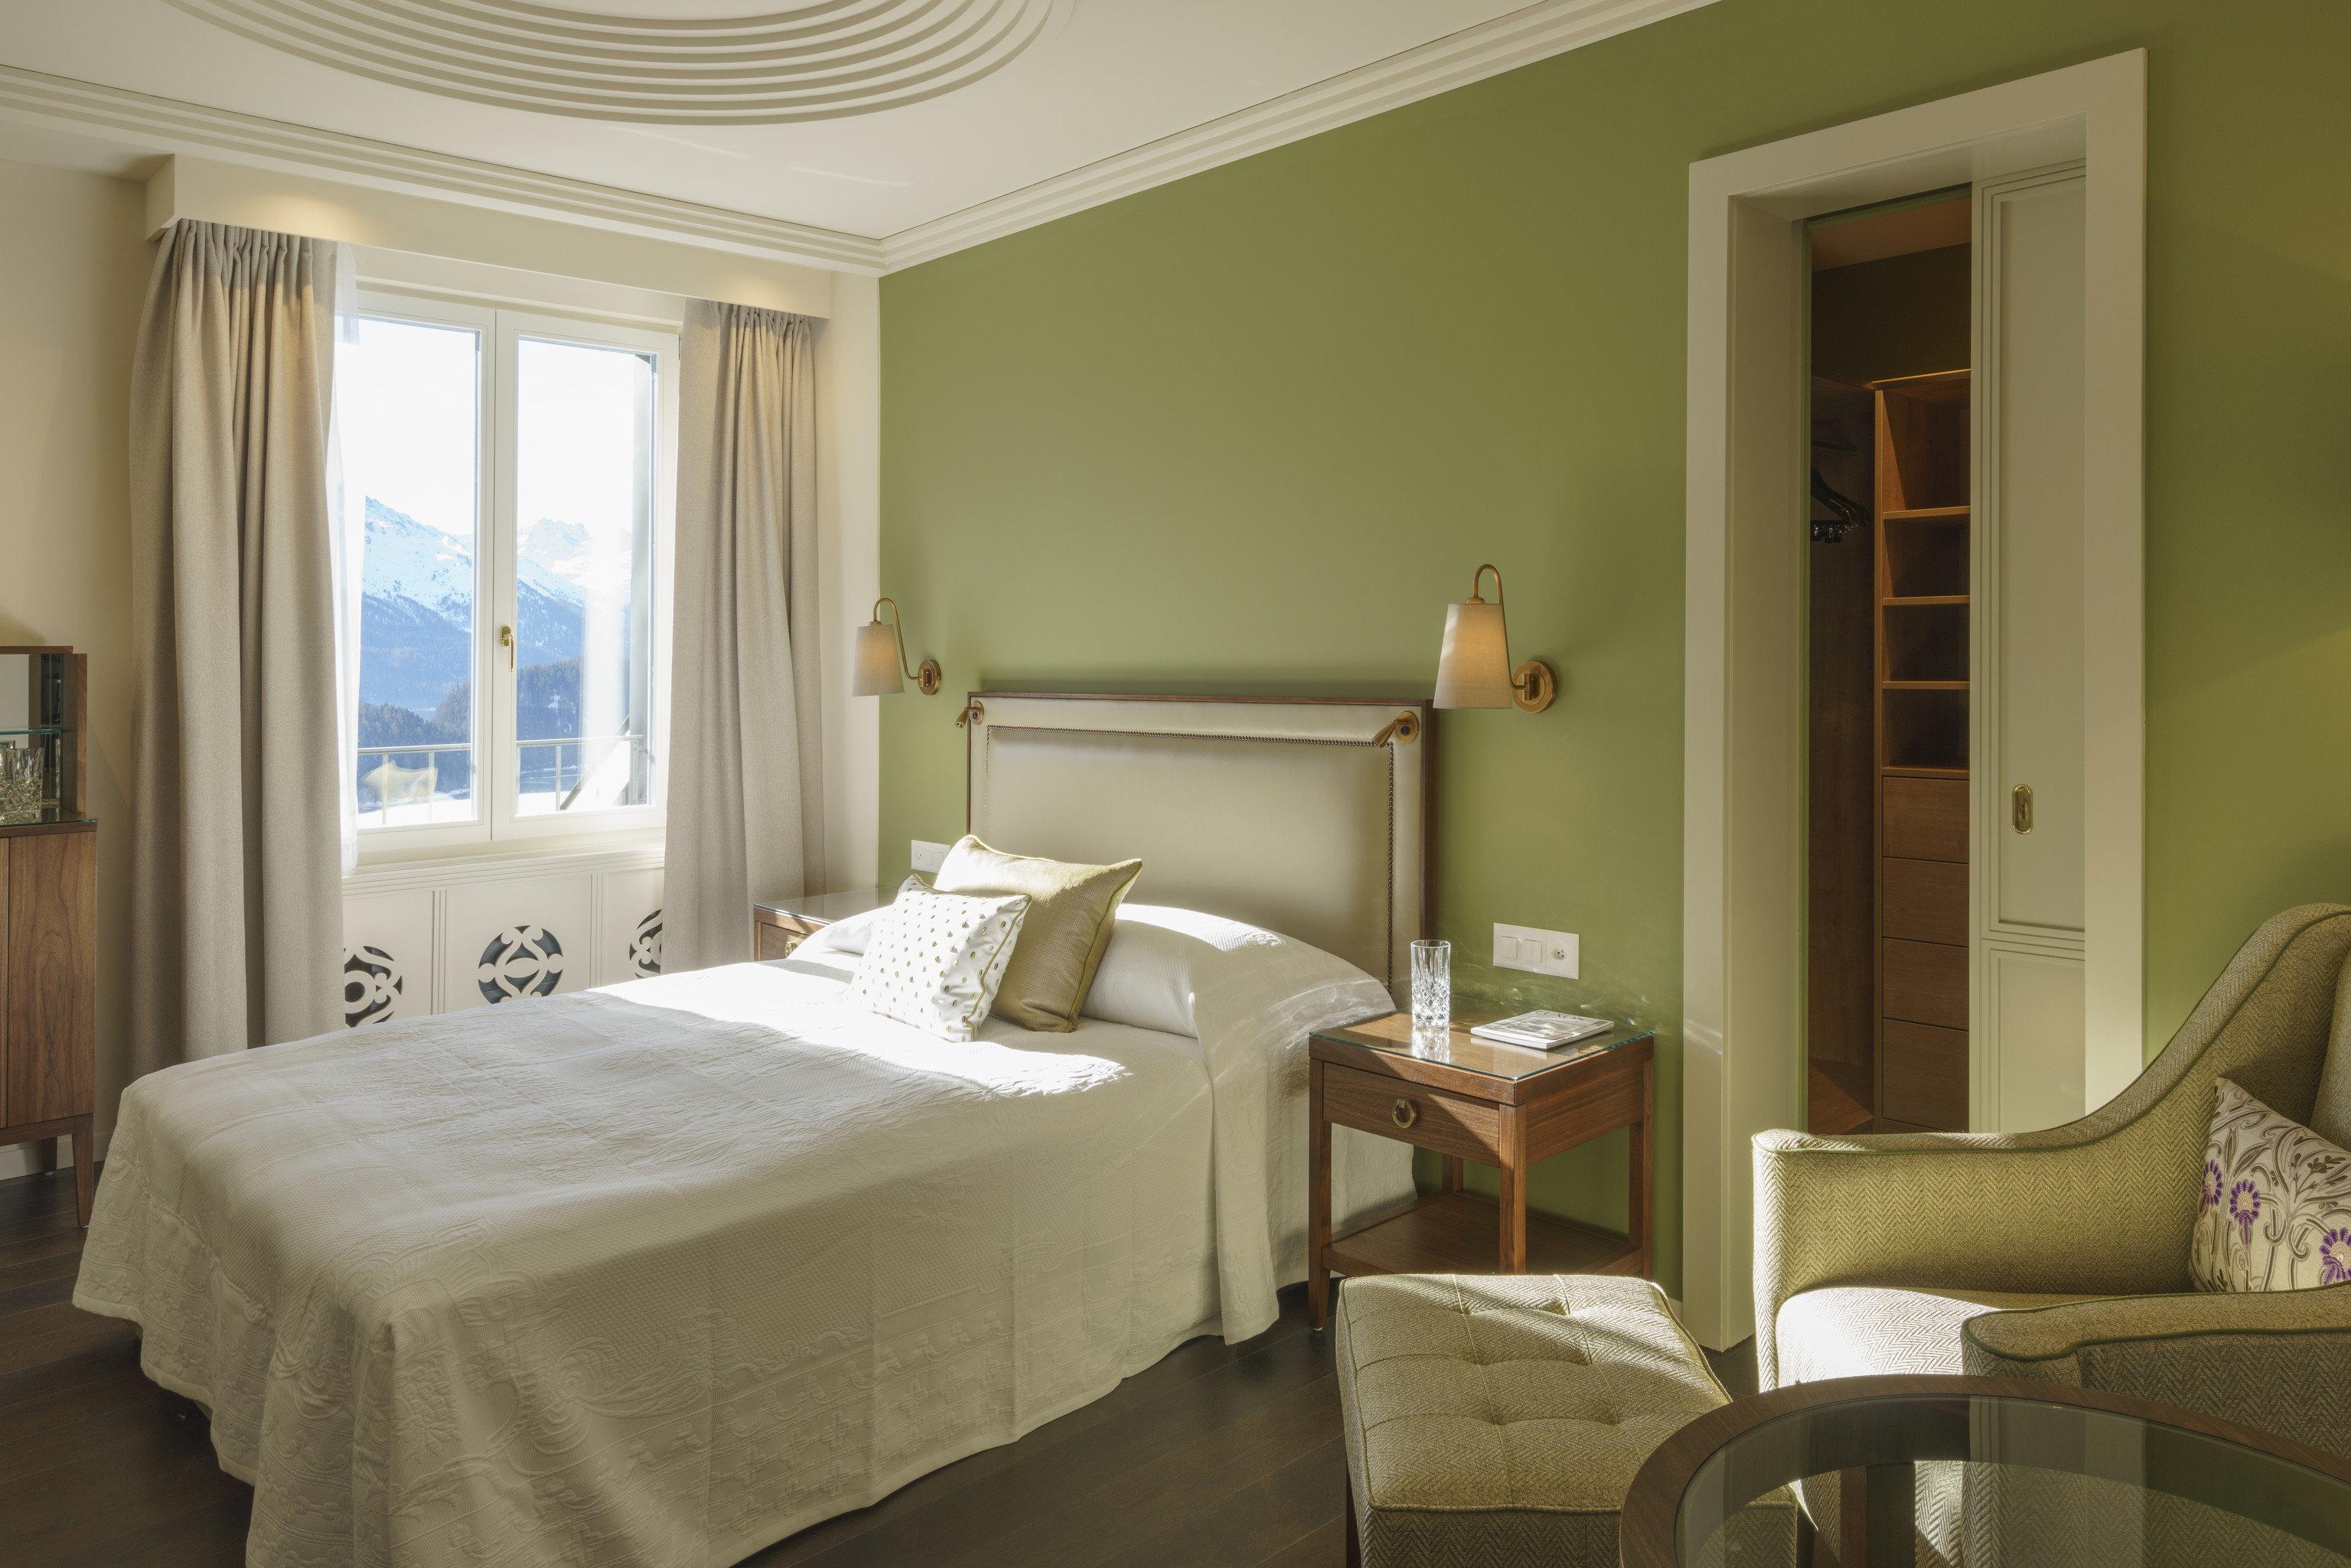 Bedroom Suite green home bed frame window treatment comfort tan